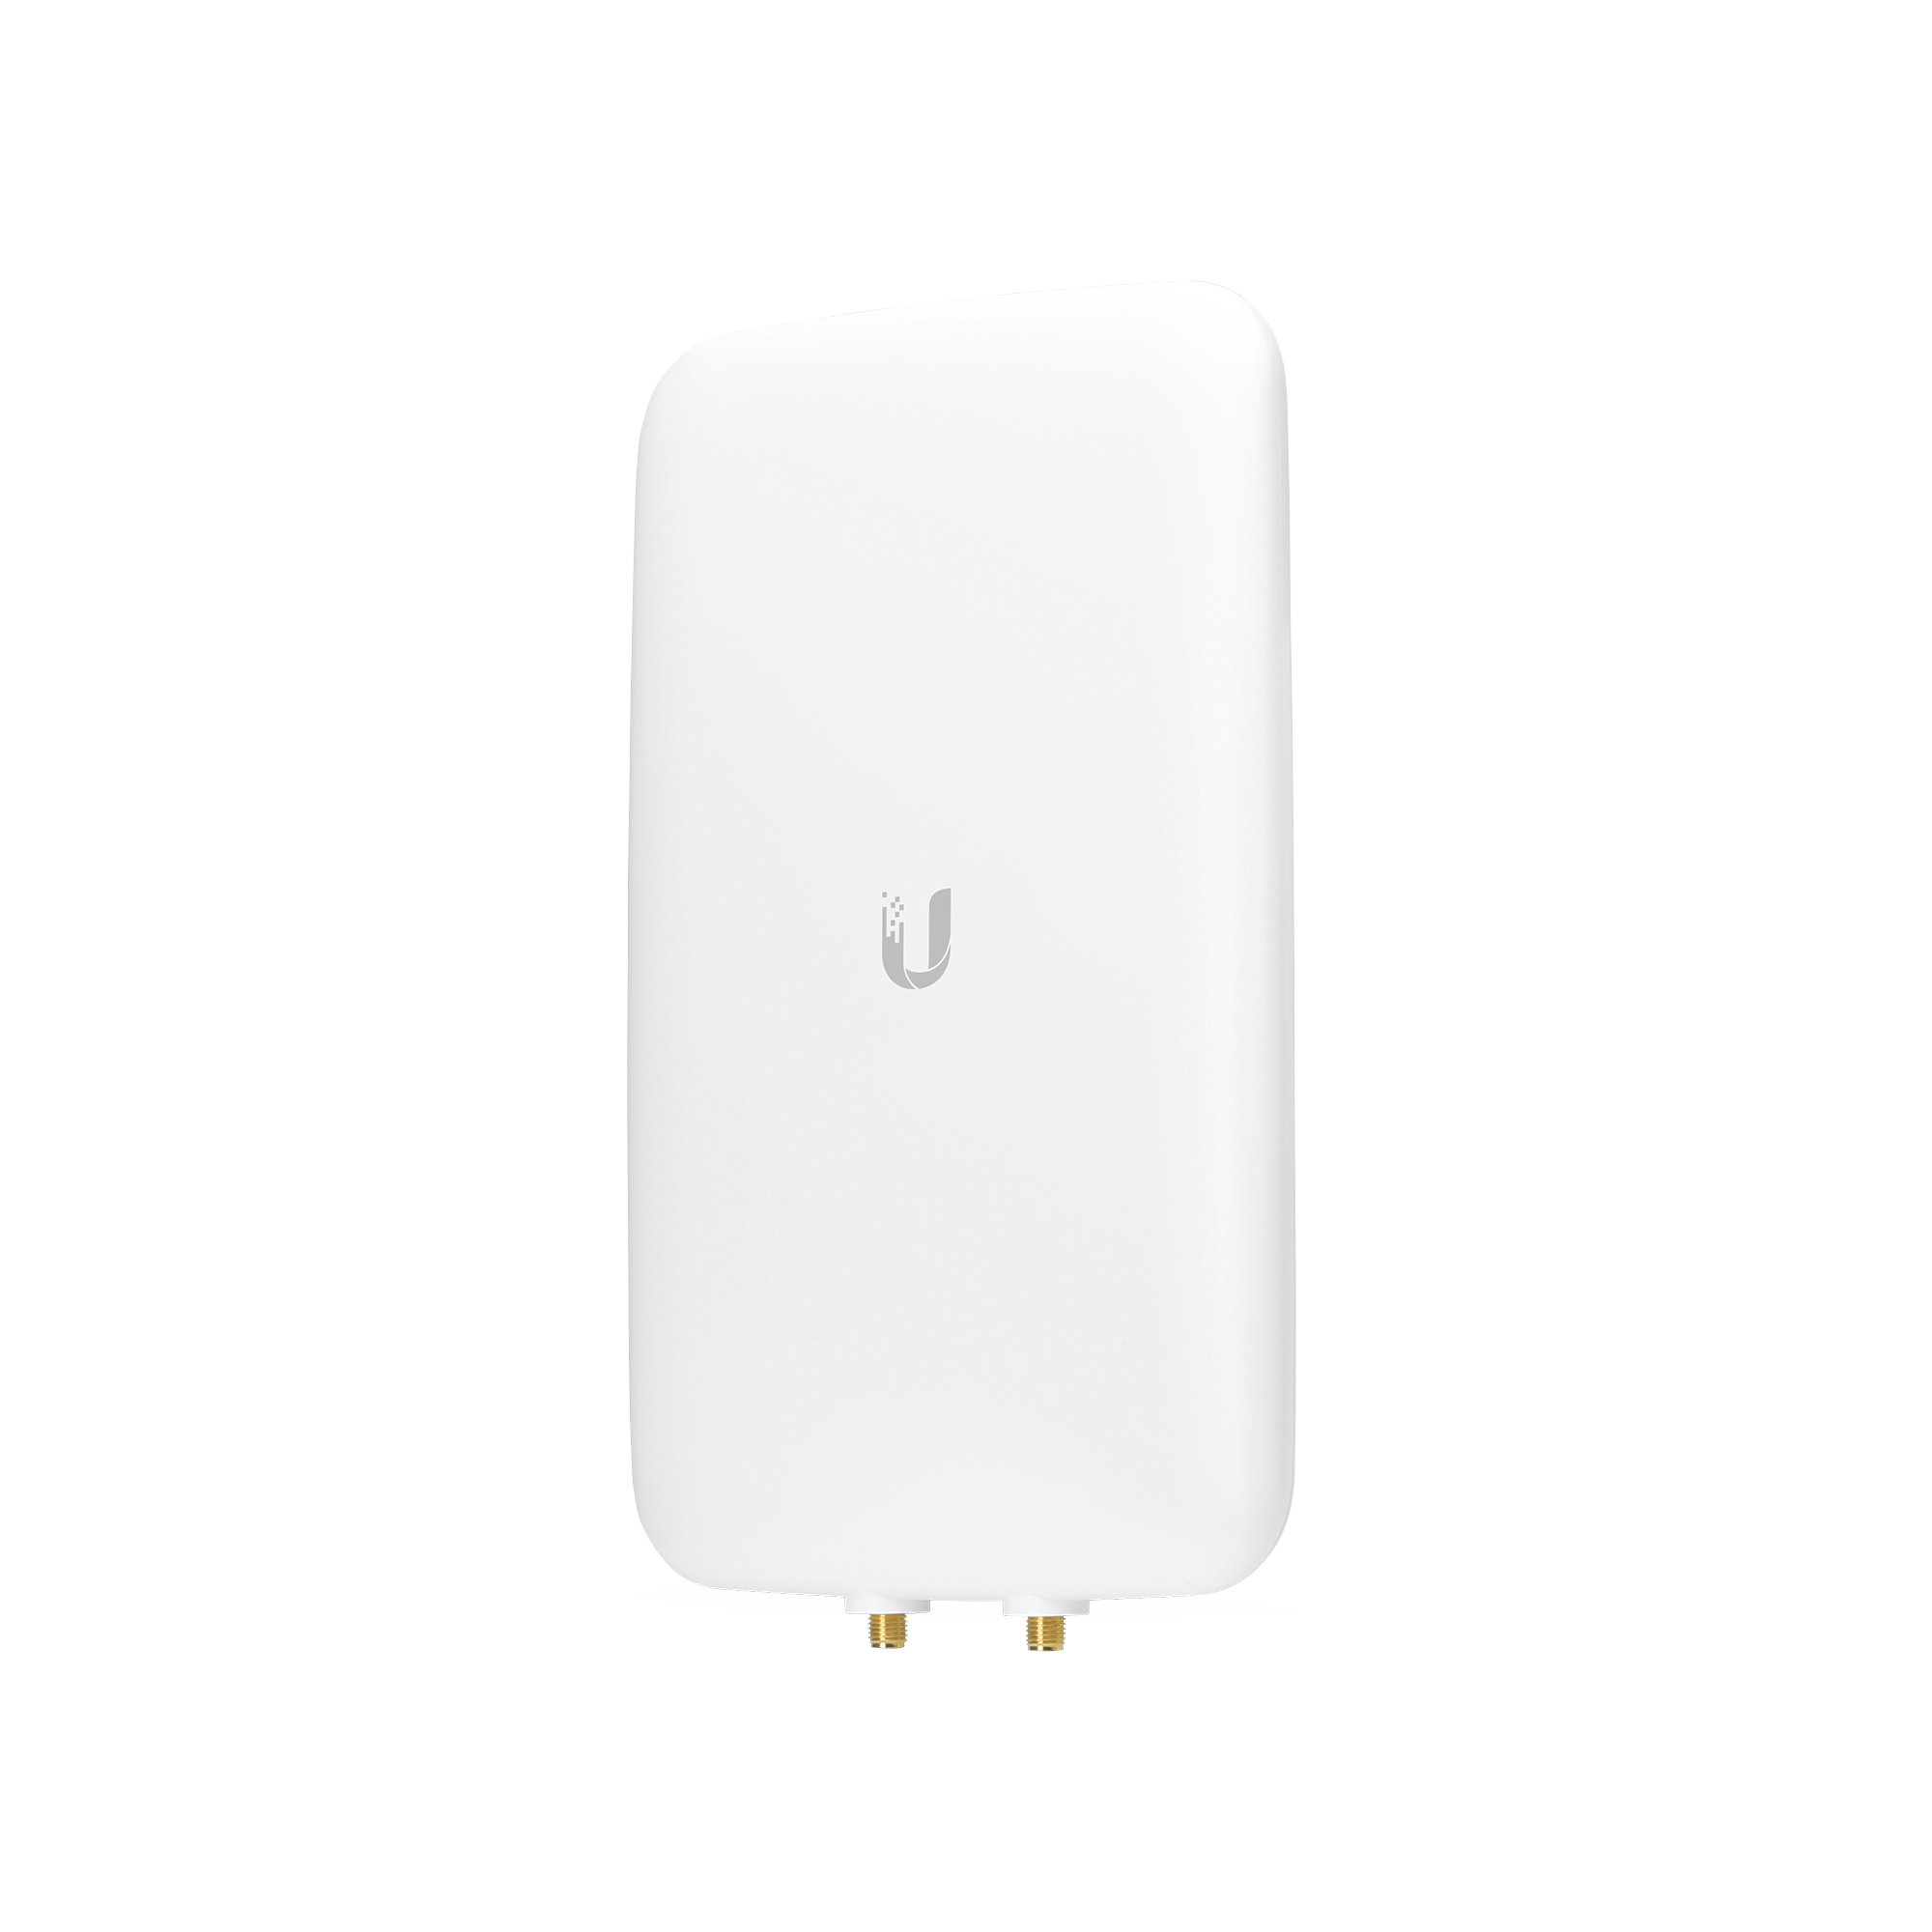 Antena sectorial simétrica UniFi, doble banda con apertura de 90? en 2.4 GHz (10 dBi) y 45? en 5 GHz (15dBi)